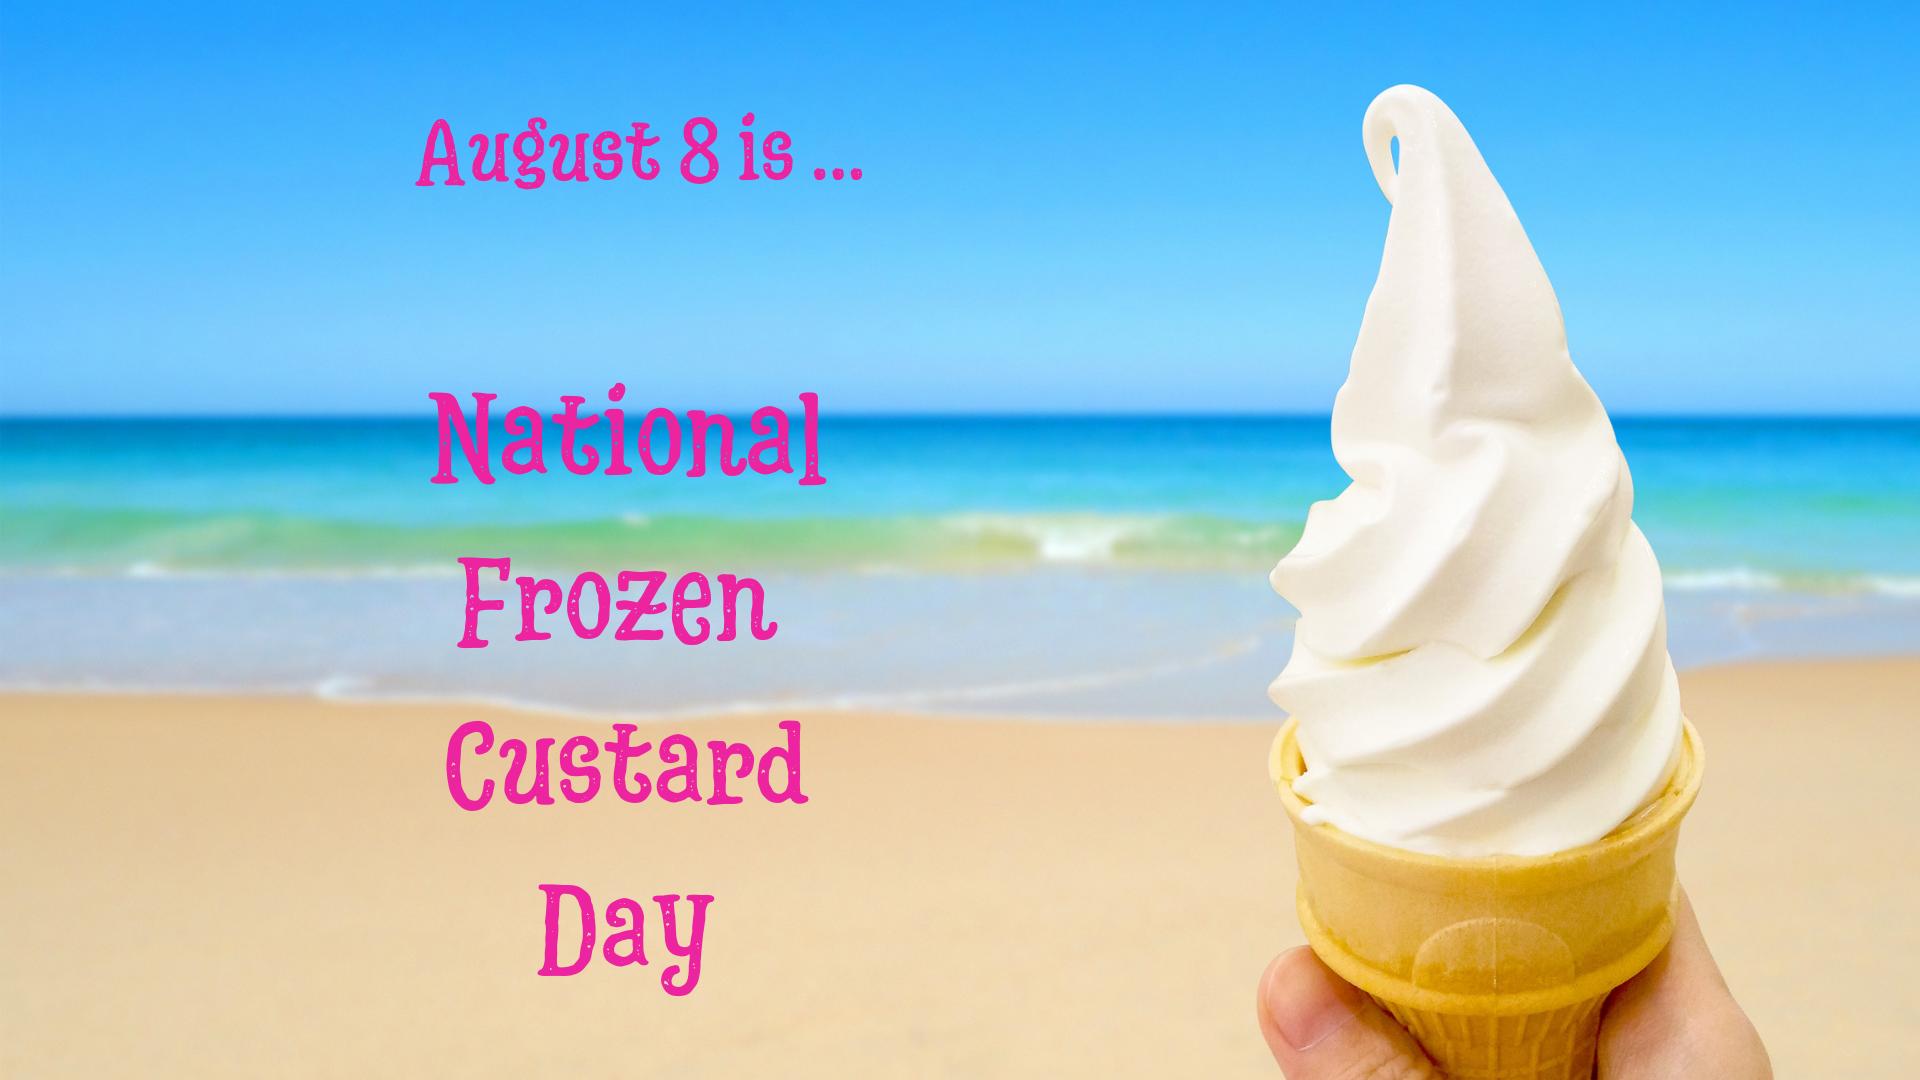 Enjoy a Treat on National Frozen Custard Day (August 8)